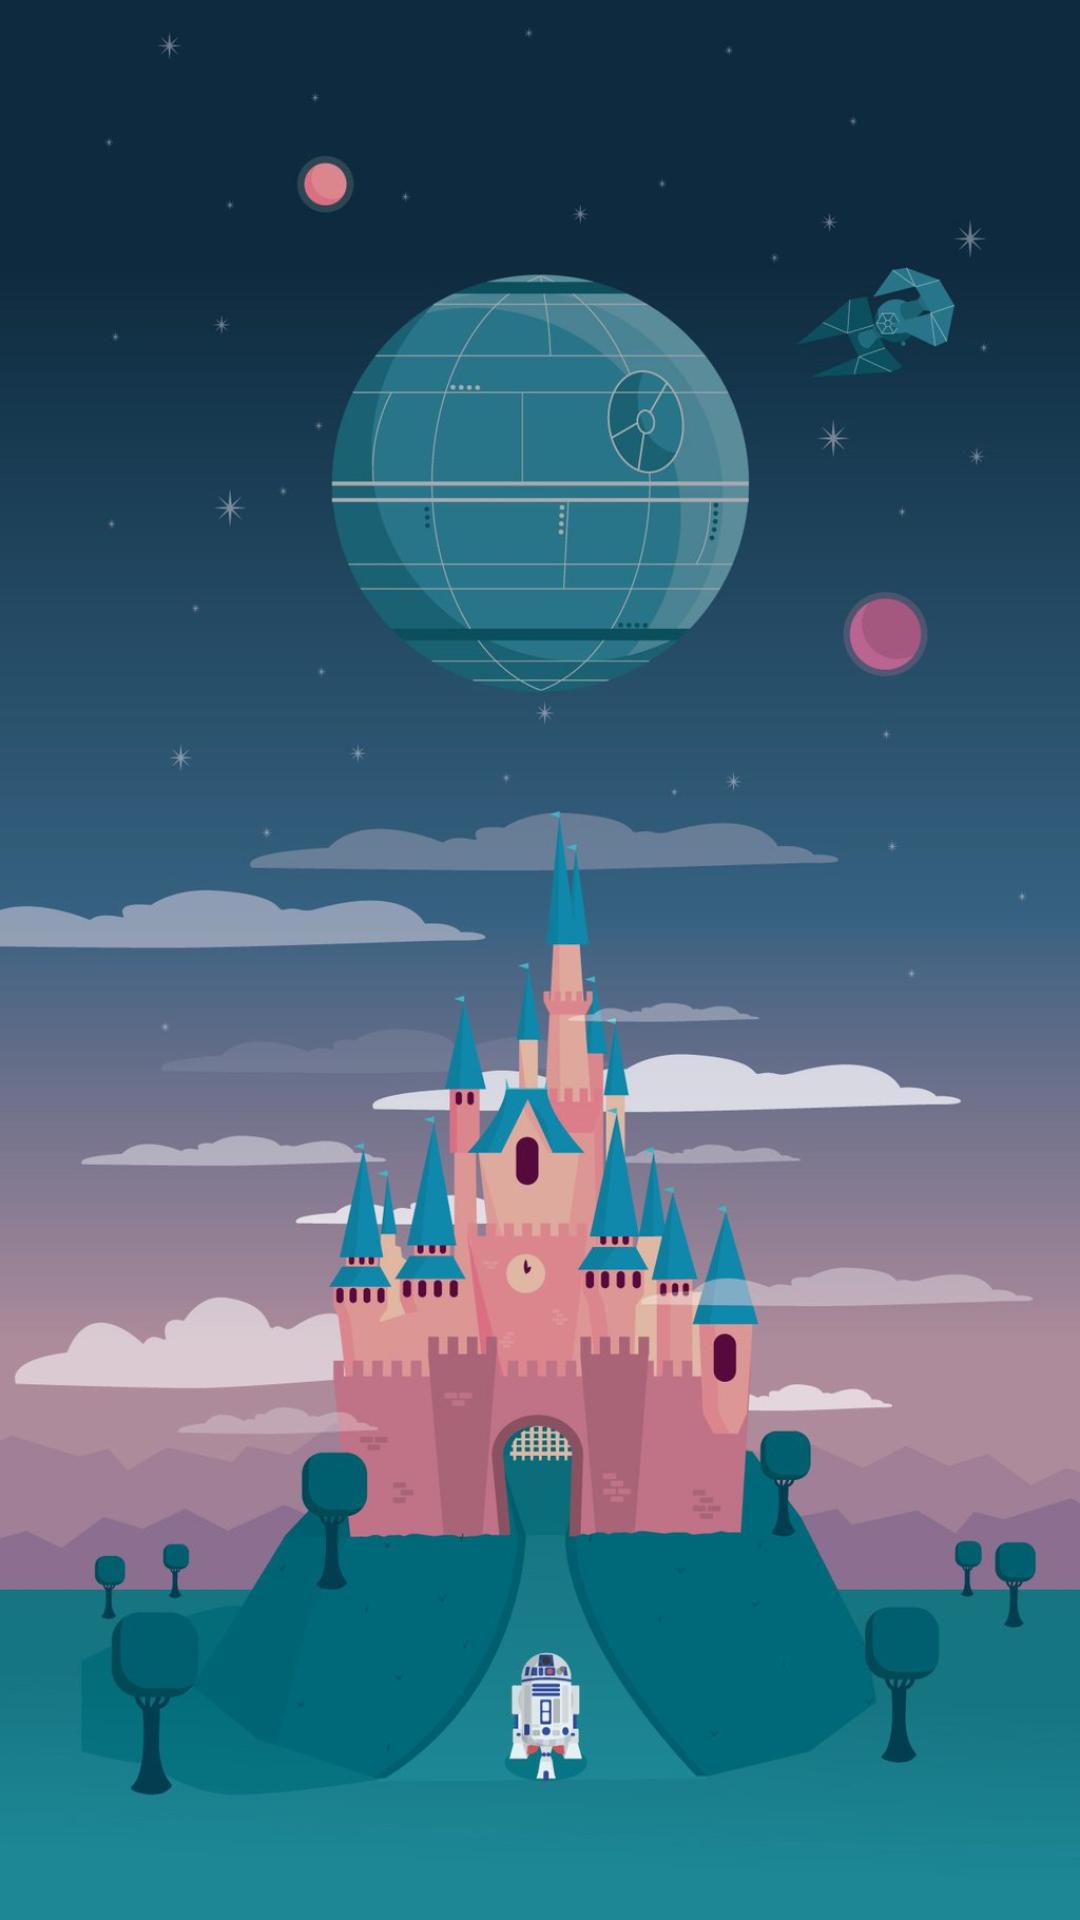 Iphone 7 Wallpaper Iphone7wallpaper In 2019 Disney Phone